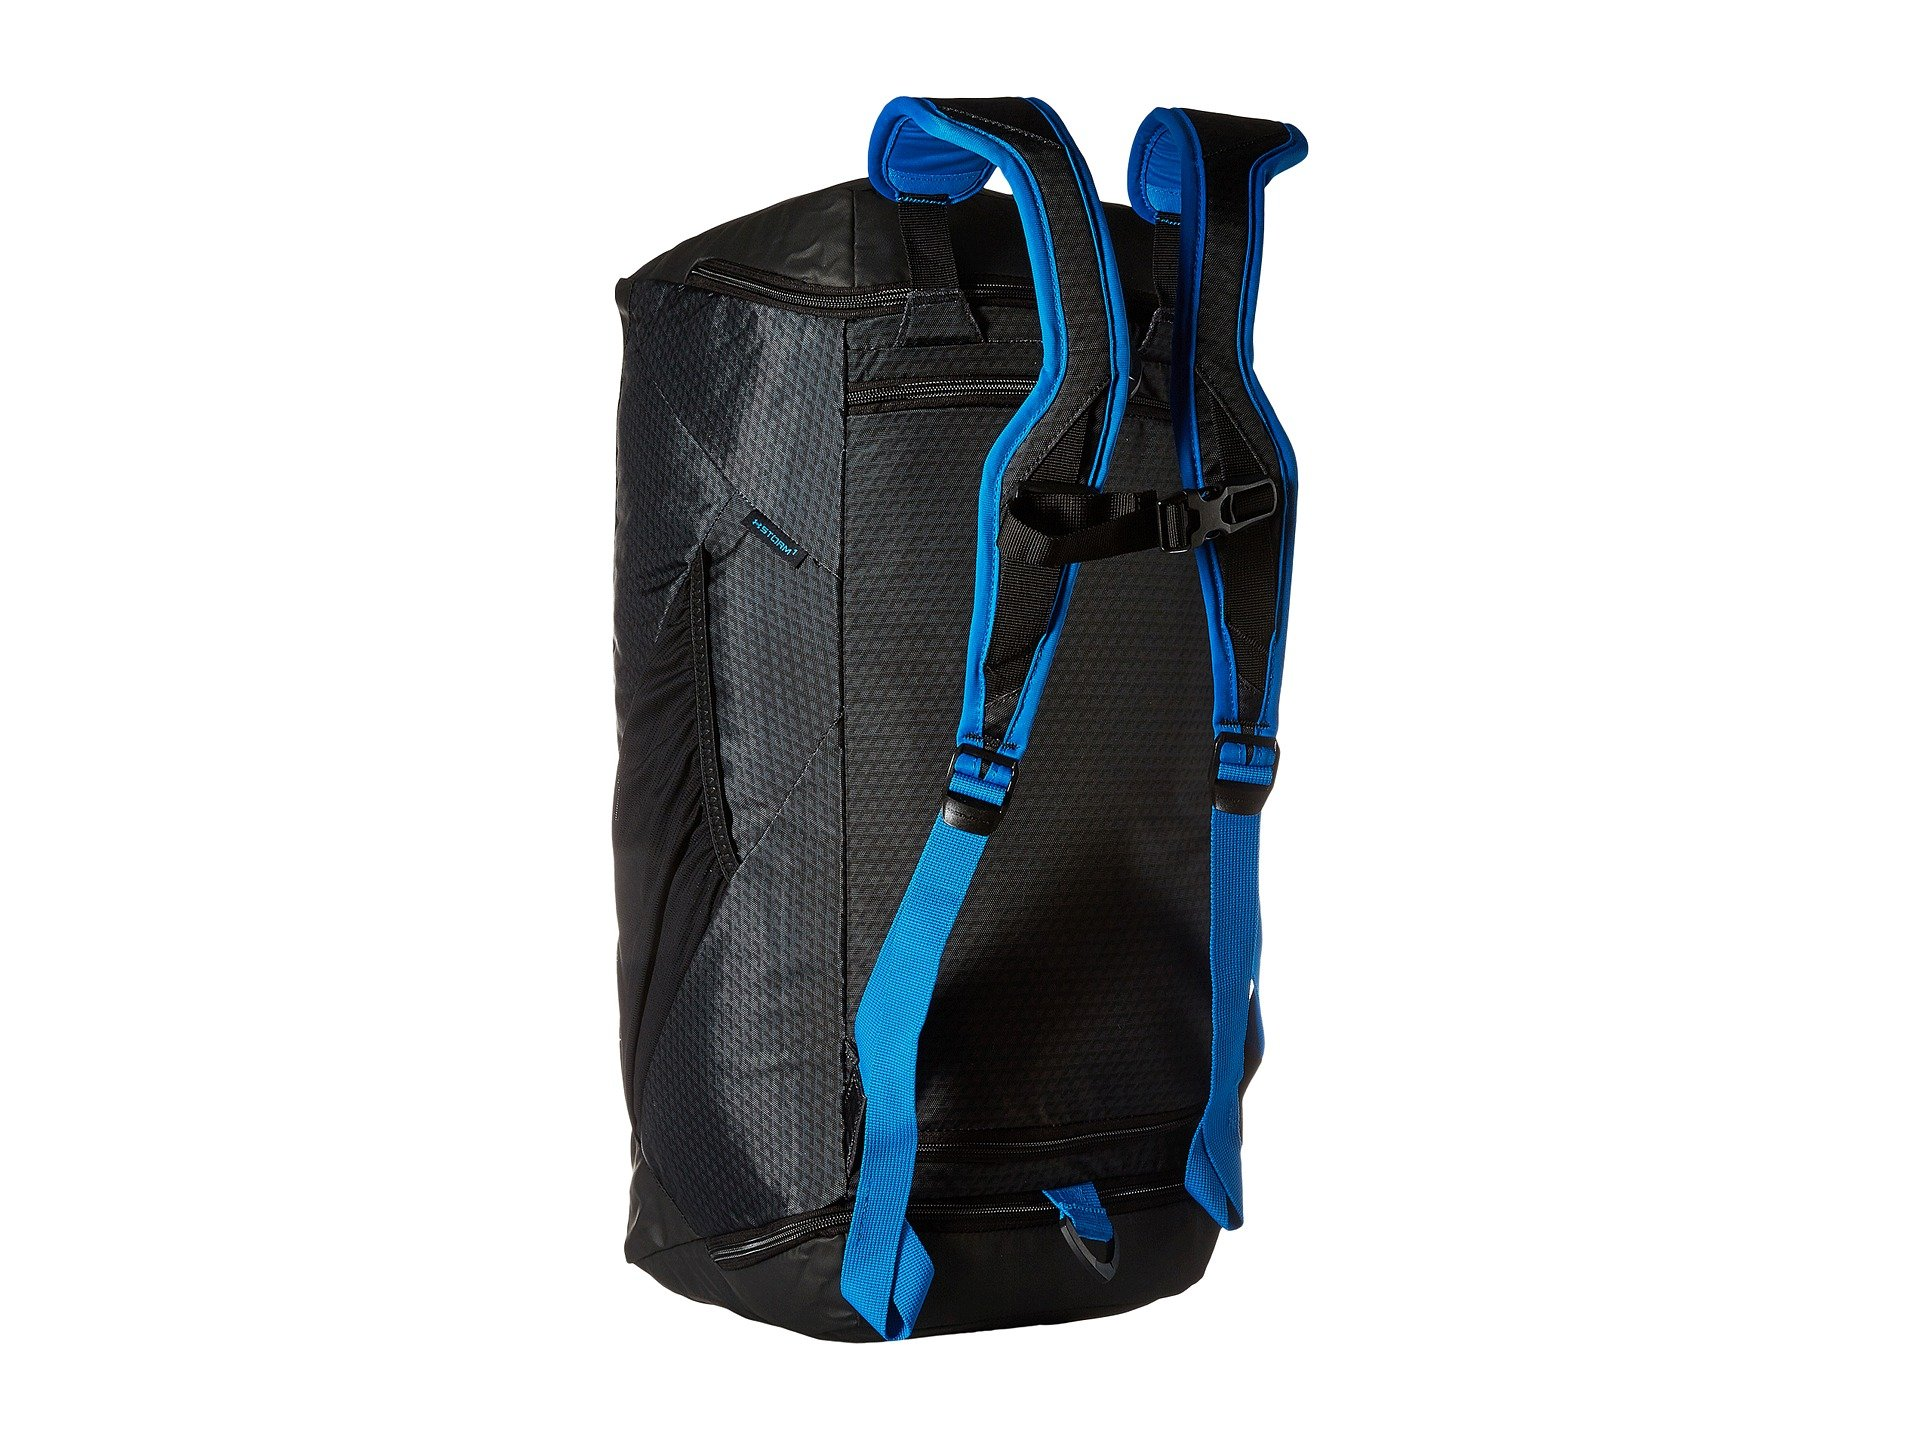 Bolso de Lona para Hombre Under Armour UA Contain Duo Backpack/Duffel  + Under Armour en VeoyCompro.net